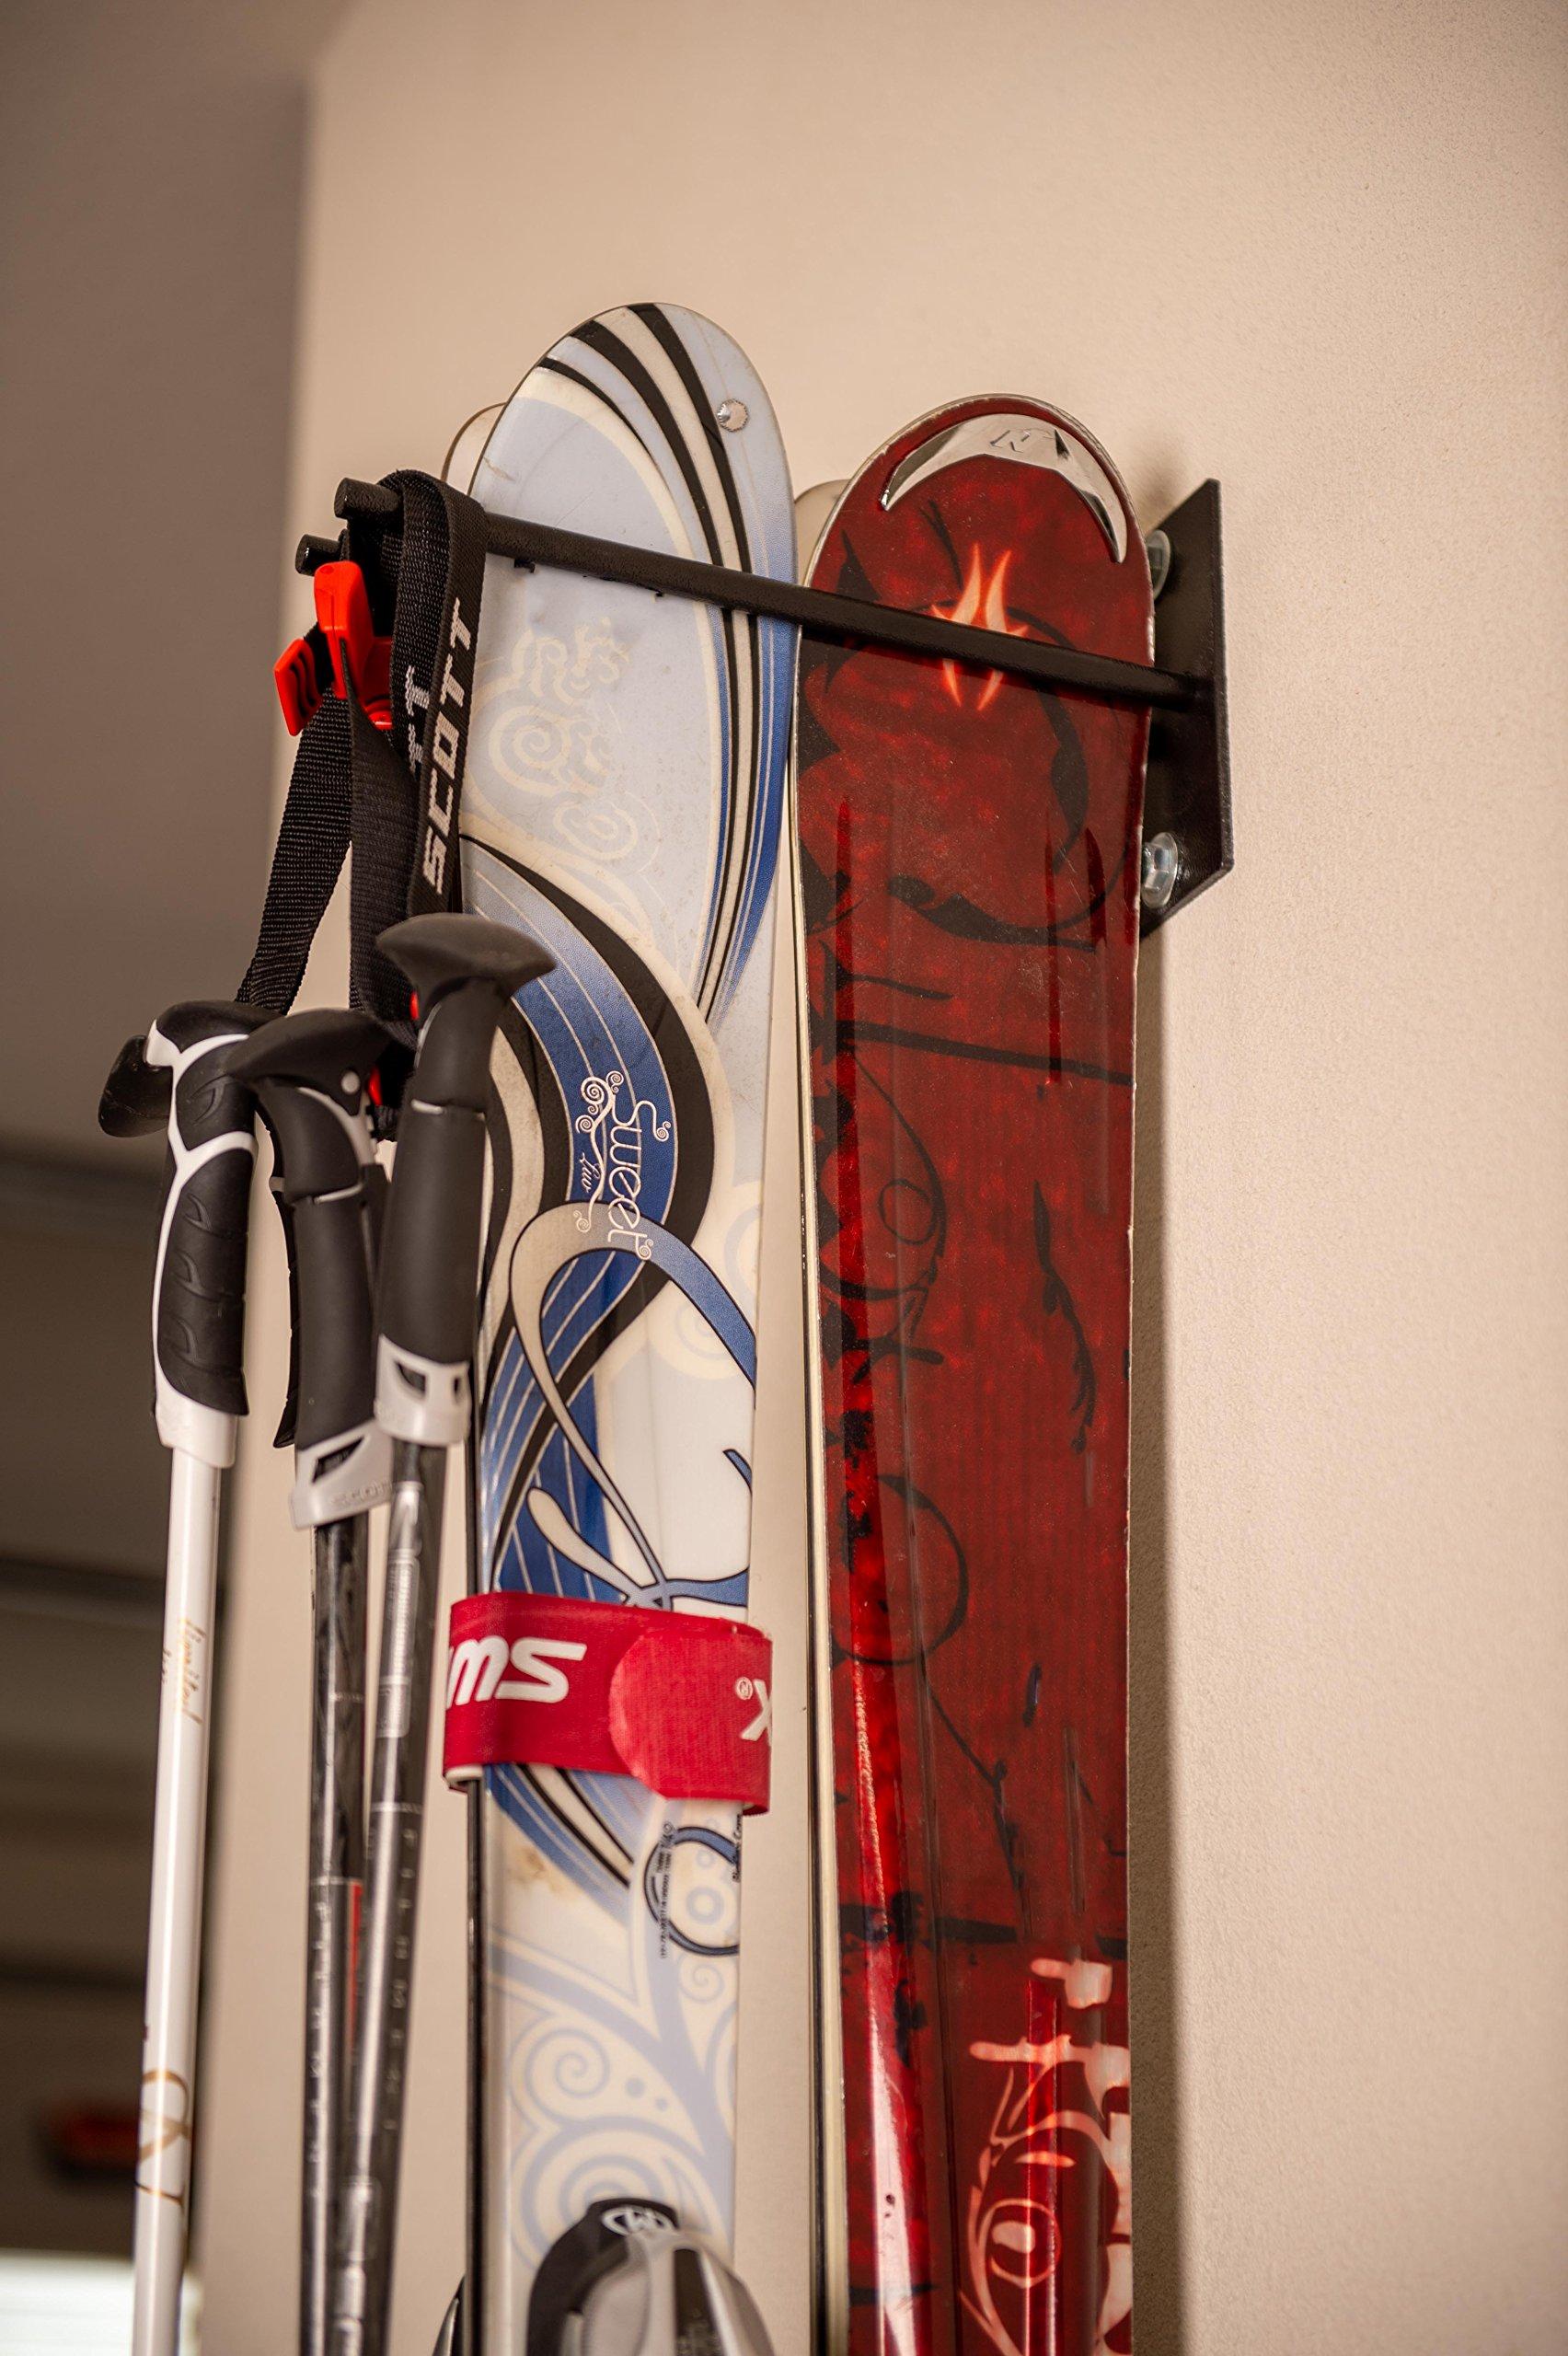 Rough Rack 1 2 Ski & Snowboard Rack